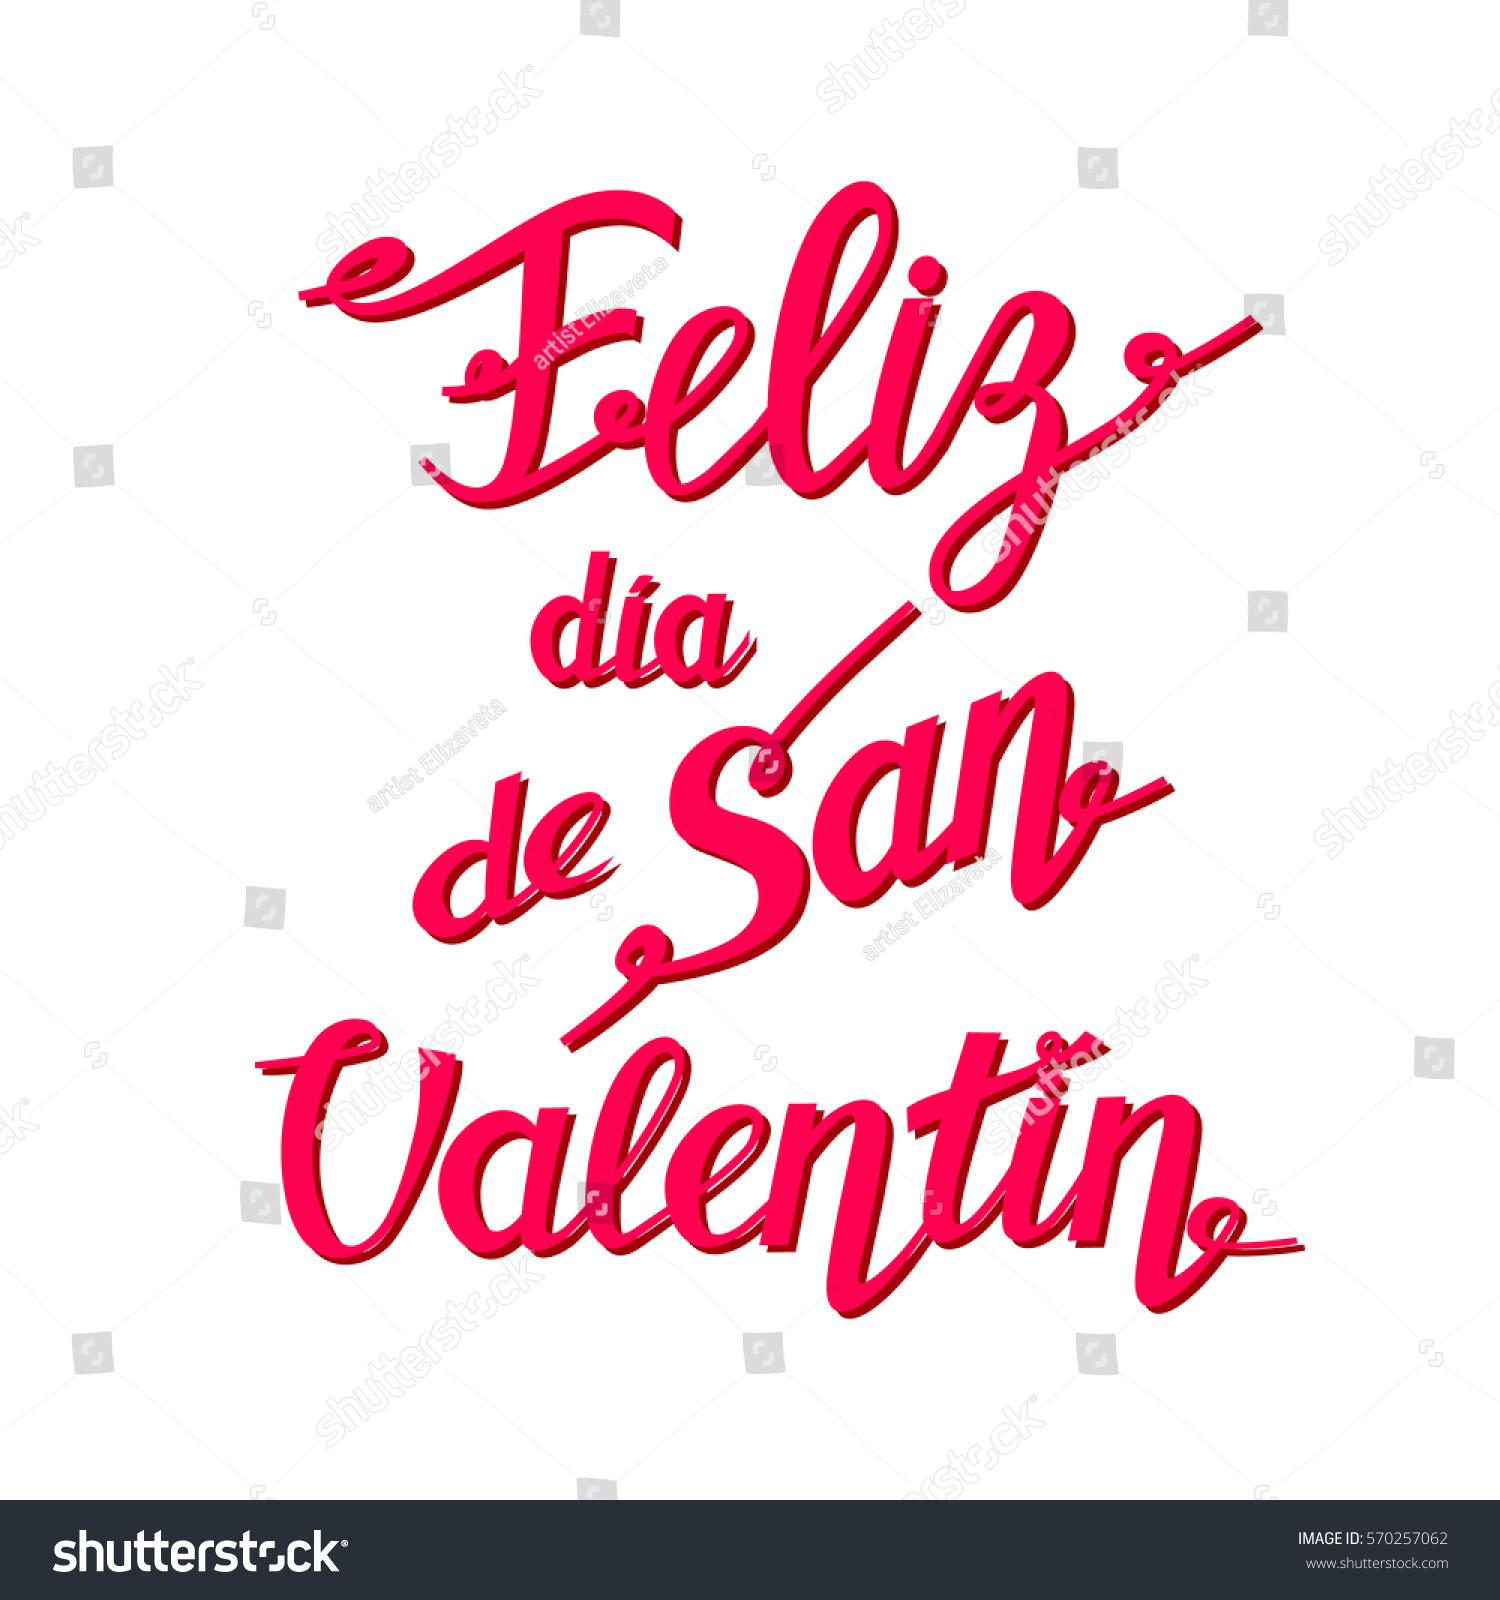 Greeting Card On Valentines Day. Feliz Dia De San Valentin   Happy Valentineu0027s  Day Translated